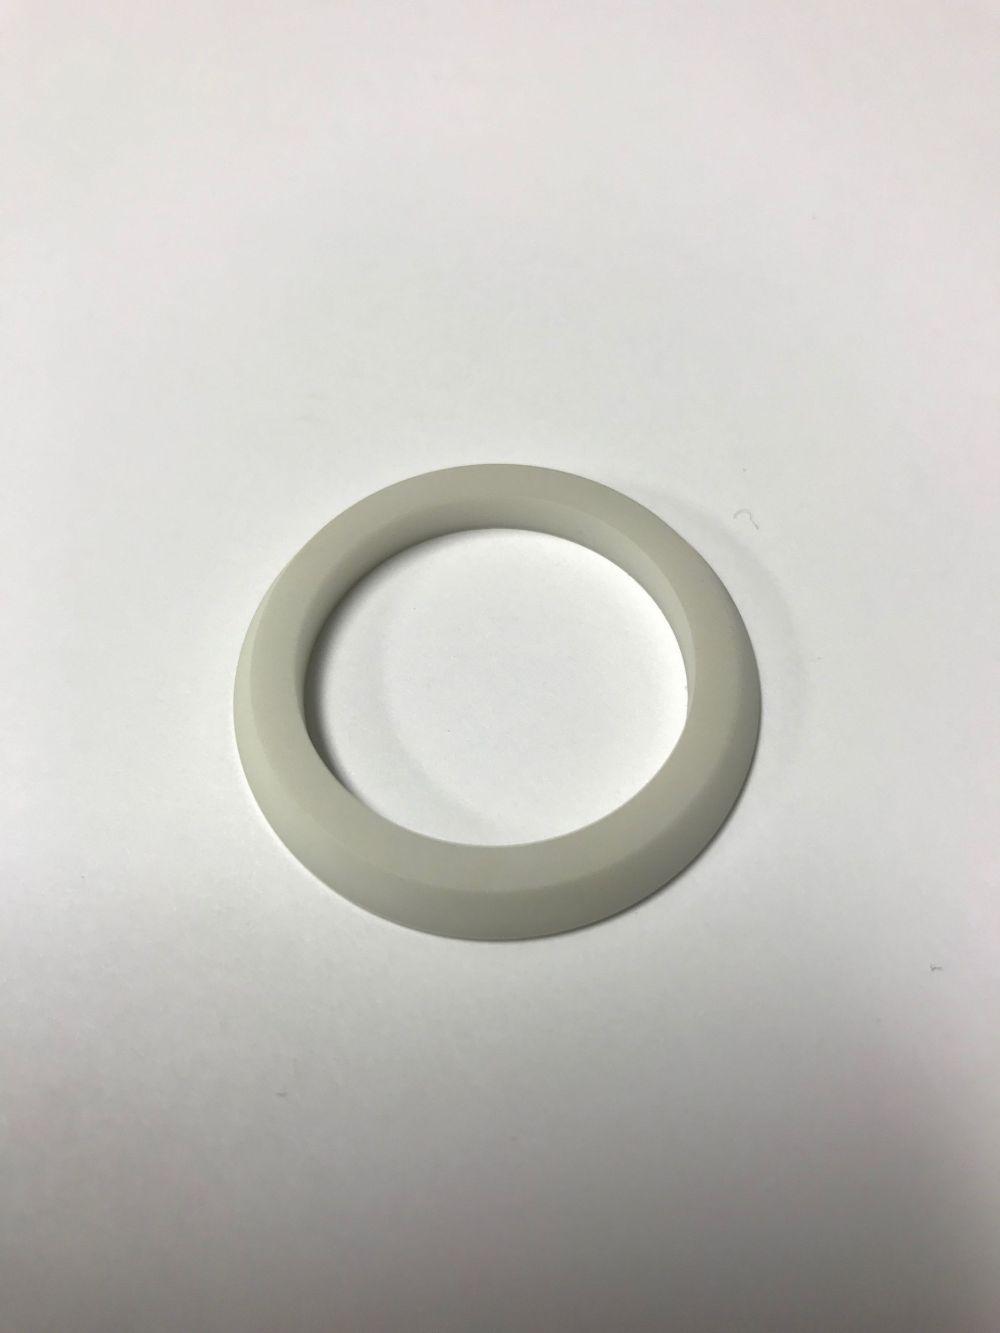 Highyag Insulating Ring 08-12-04-9016 - RMTCS0013